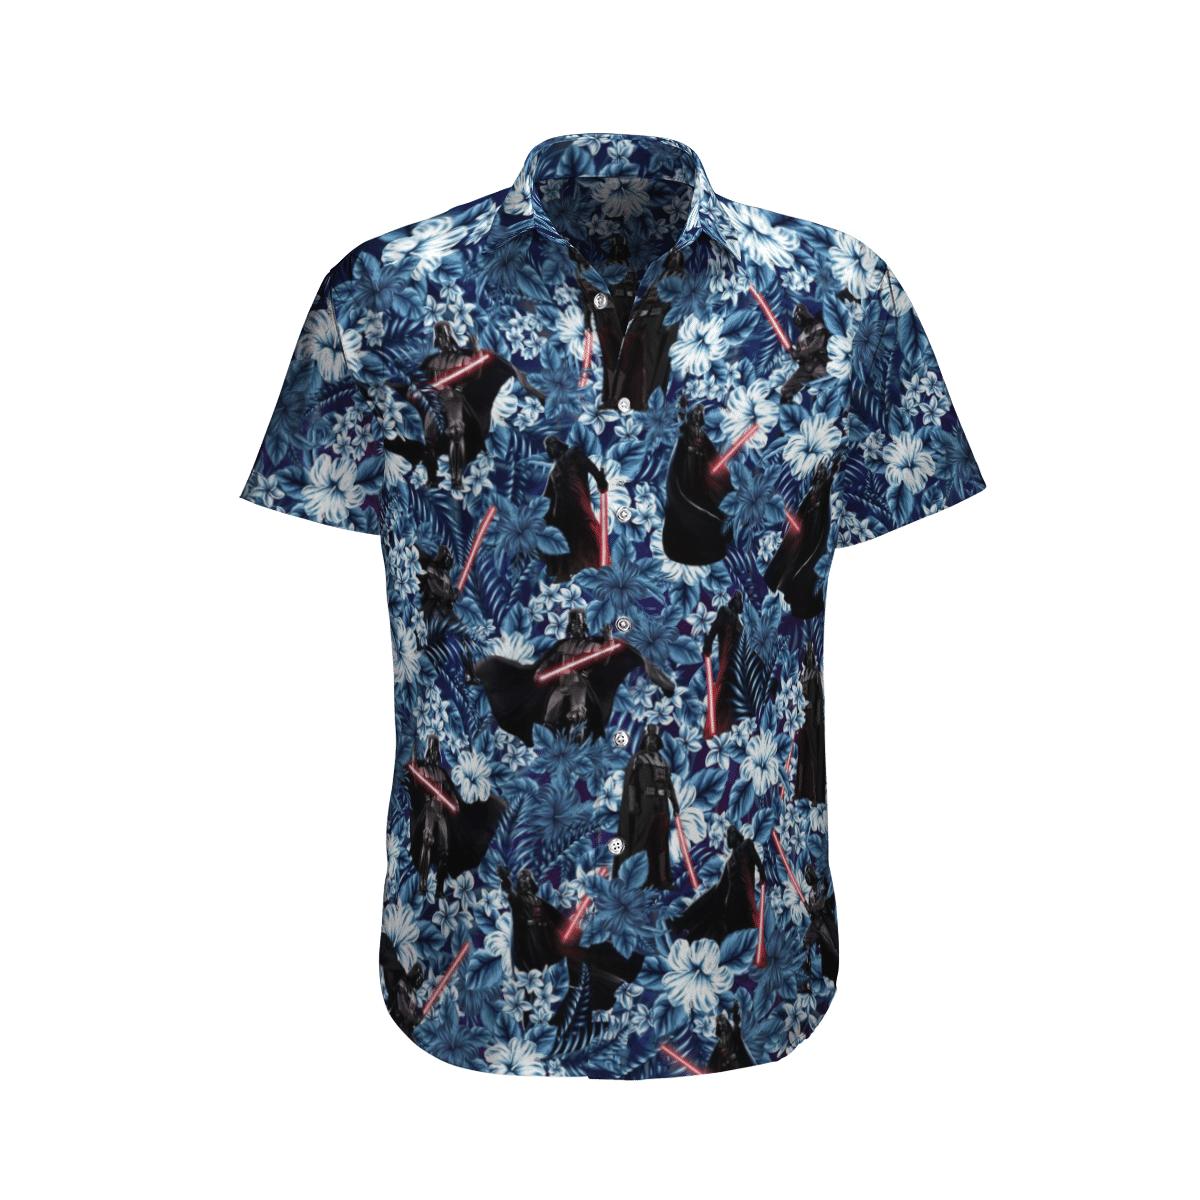 Star Wars Darth Vader with Lightsaber Floral Hawaiian Shirt